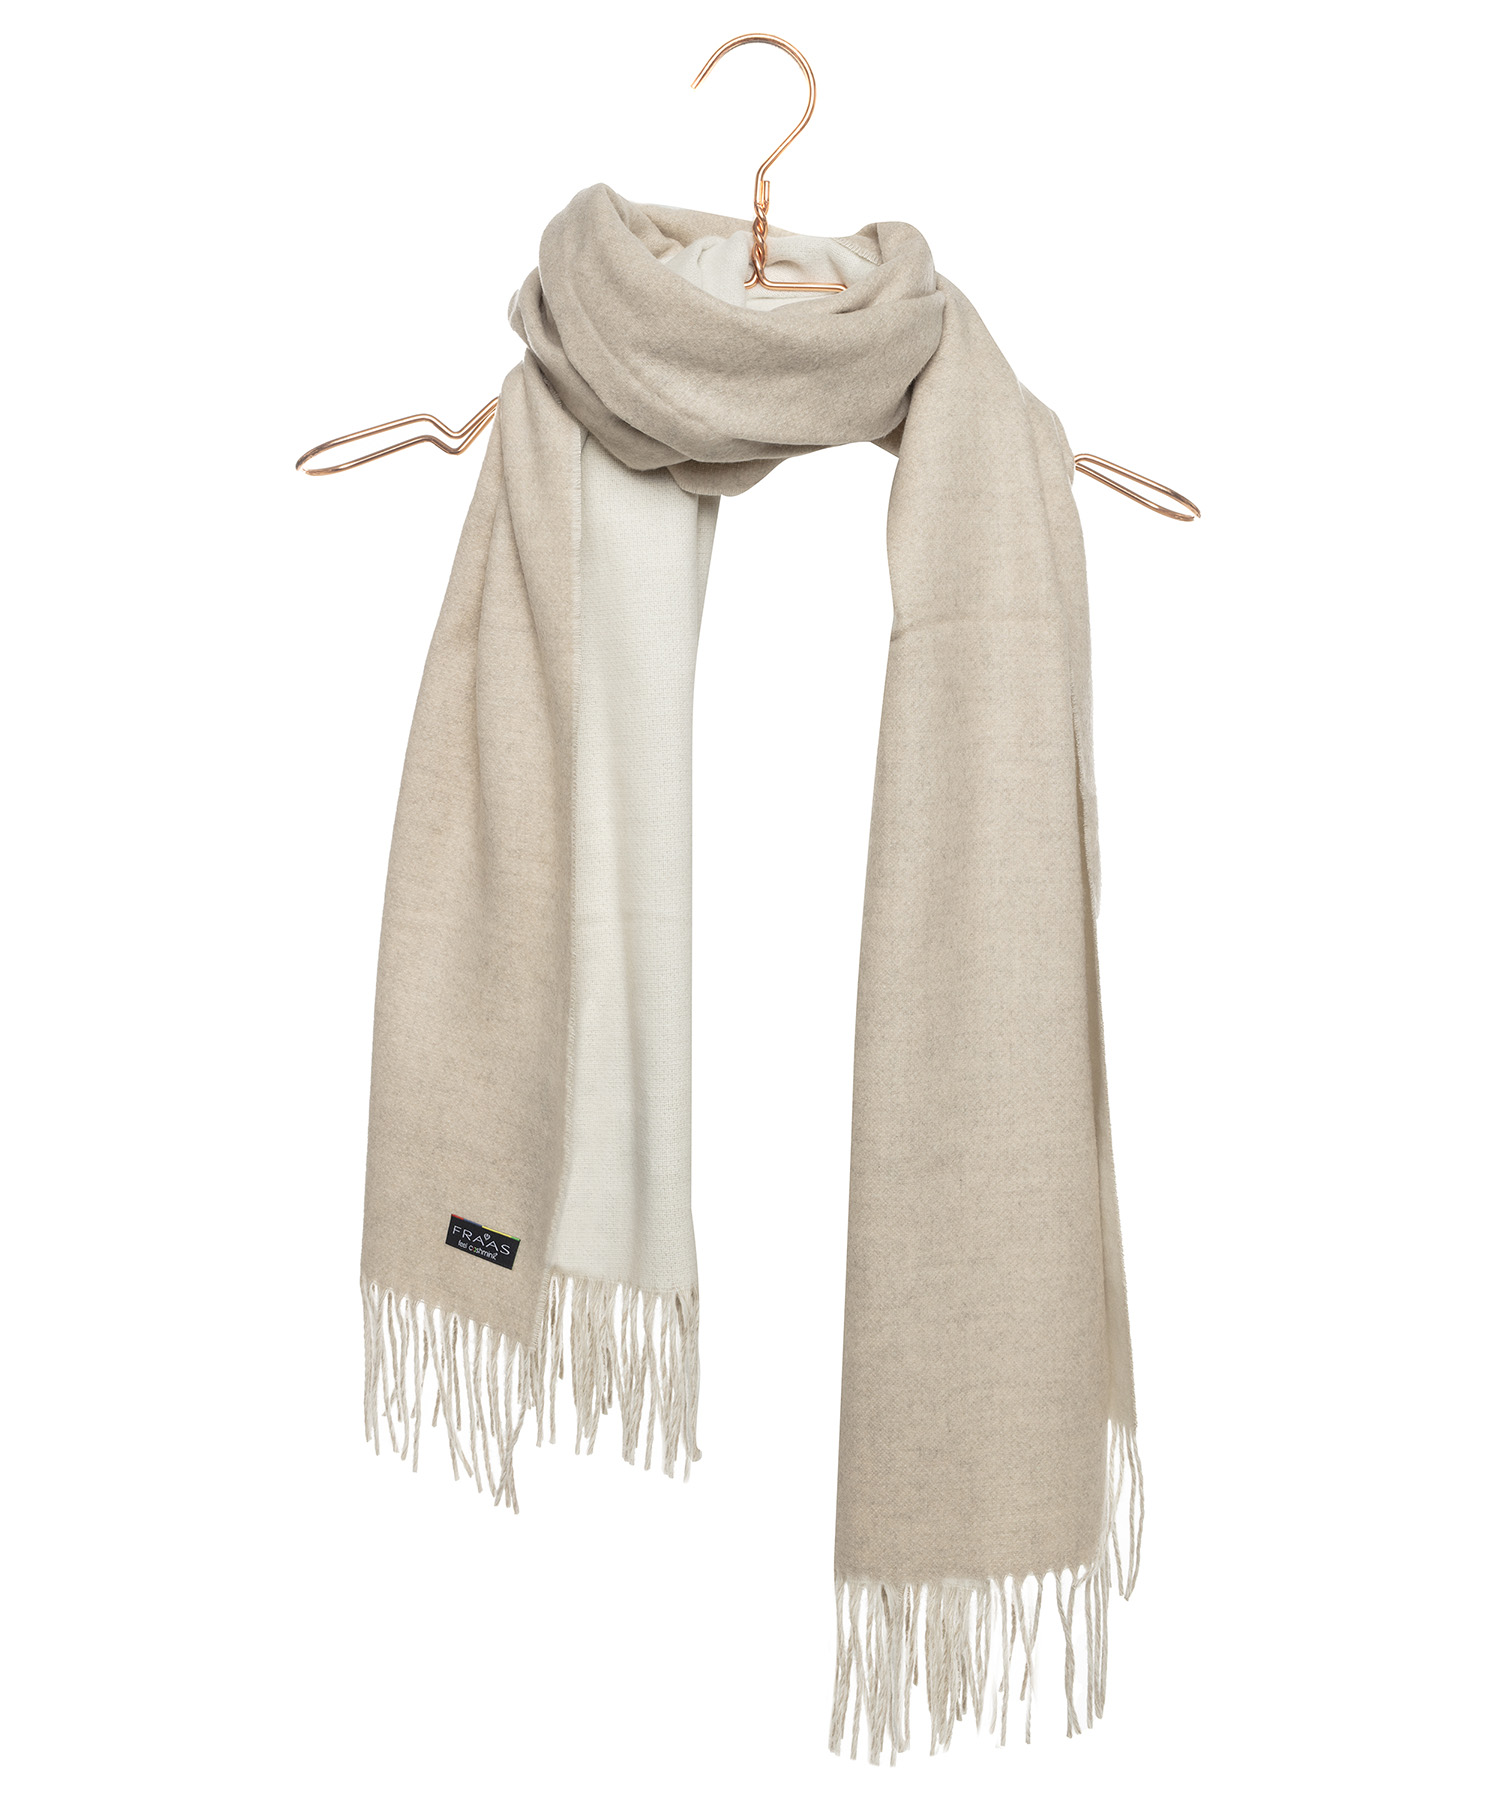 Fraas shawl